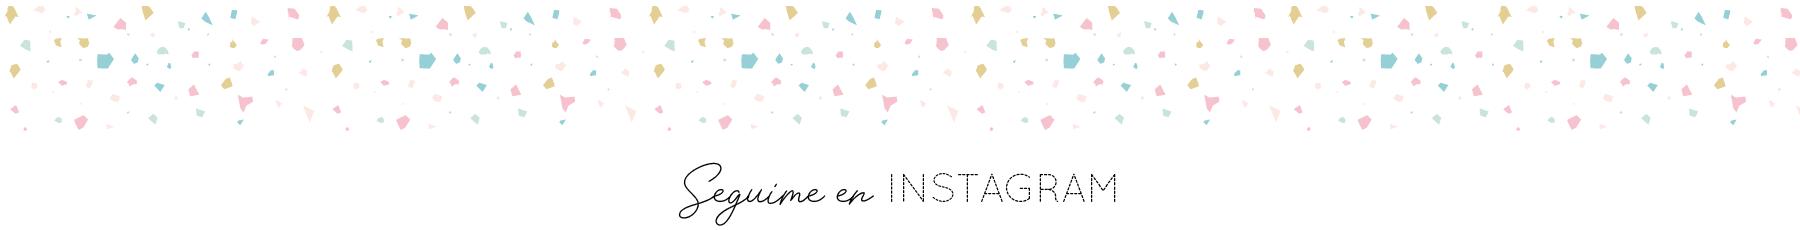 Seguime-en-Instagram-Hannah-Creates